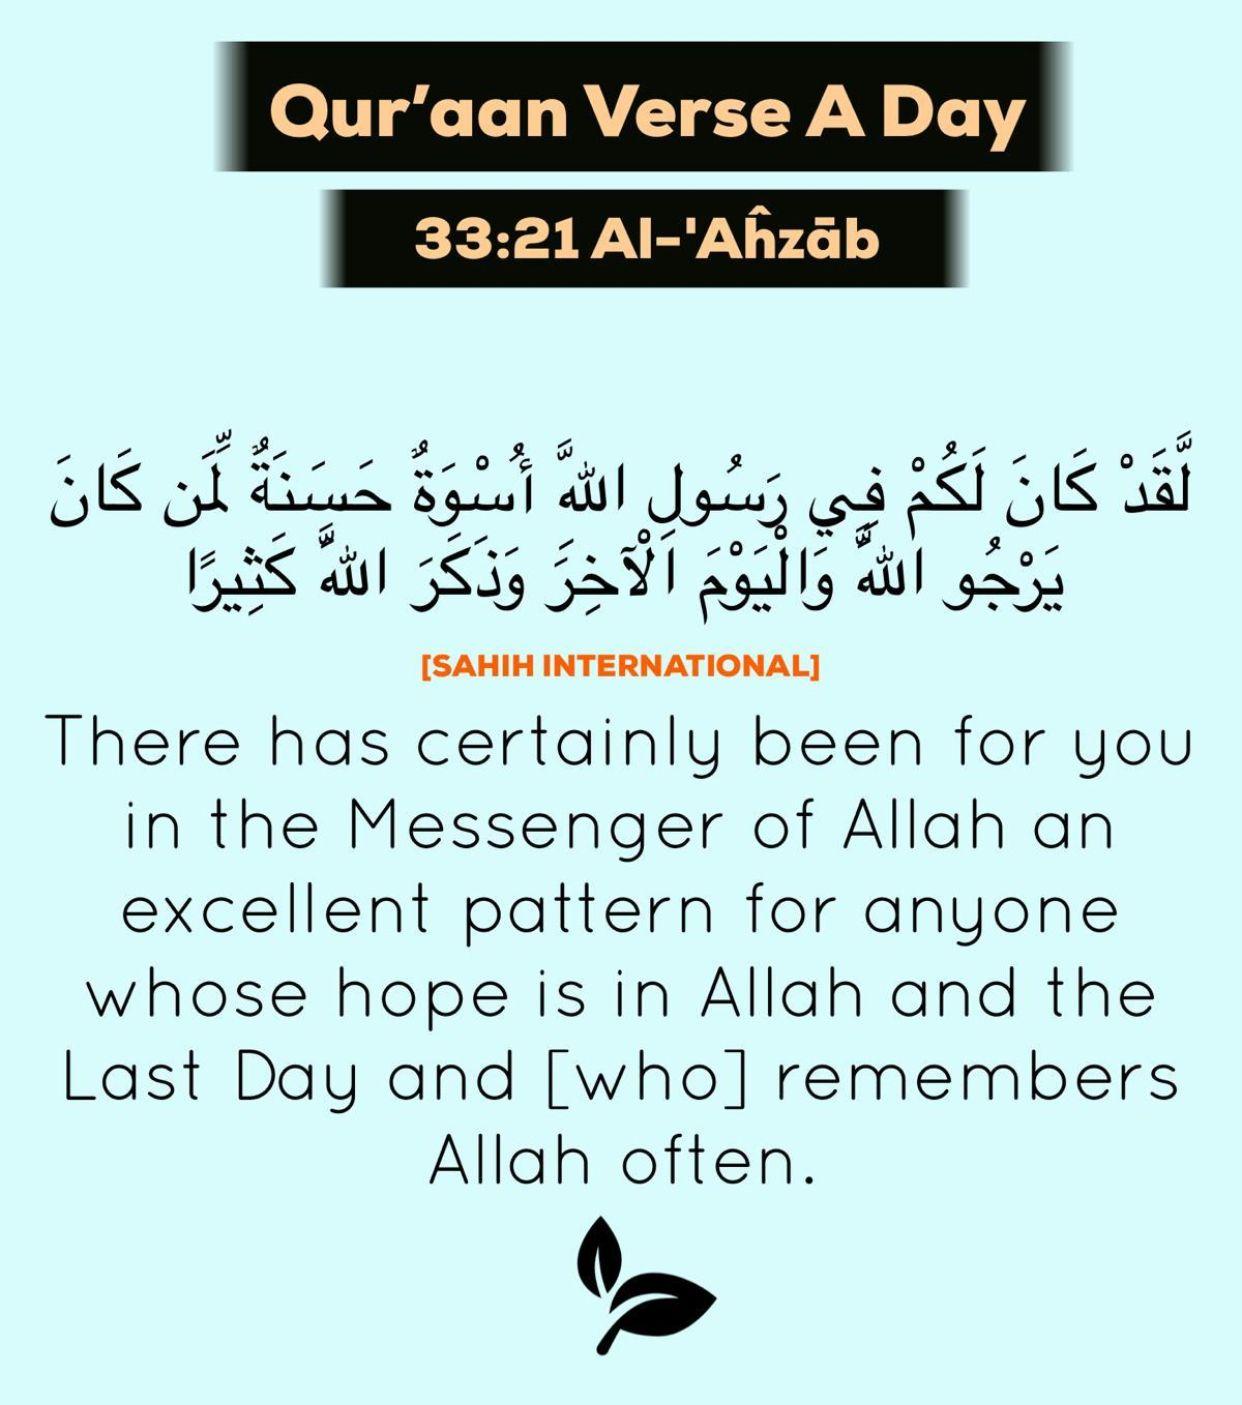 Pin By Fahad Baloch On Quran Verses Islamic Quotes Quran Verses Quran Quotes Holy Quran